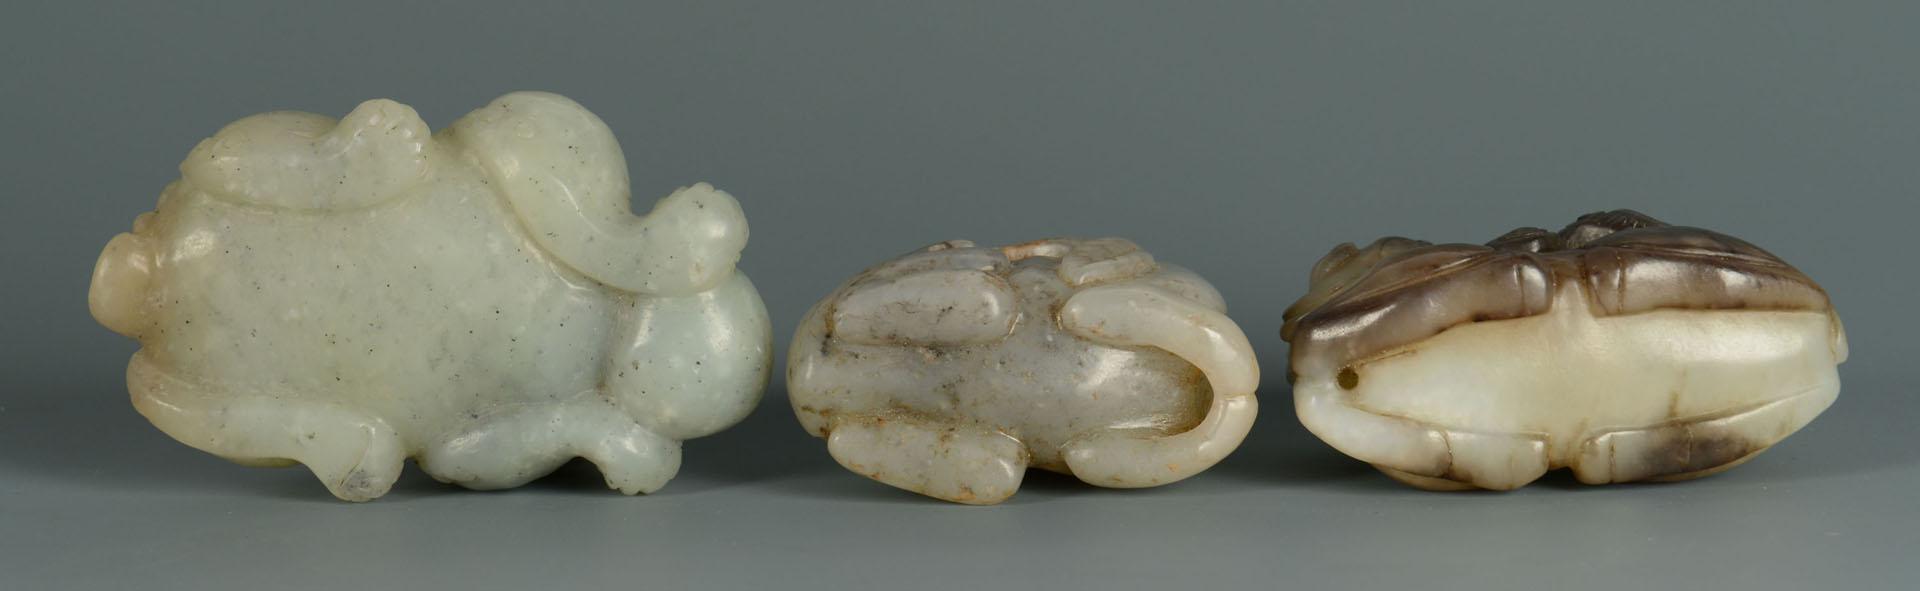 Lot 12: Group of 3 Celadon Jade Foo Dogs